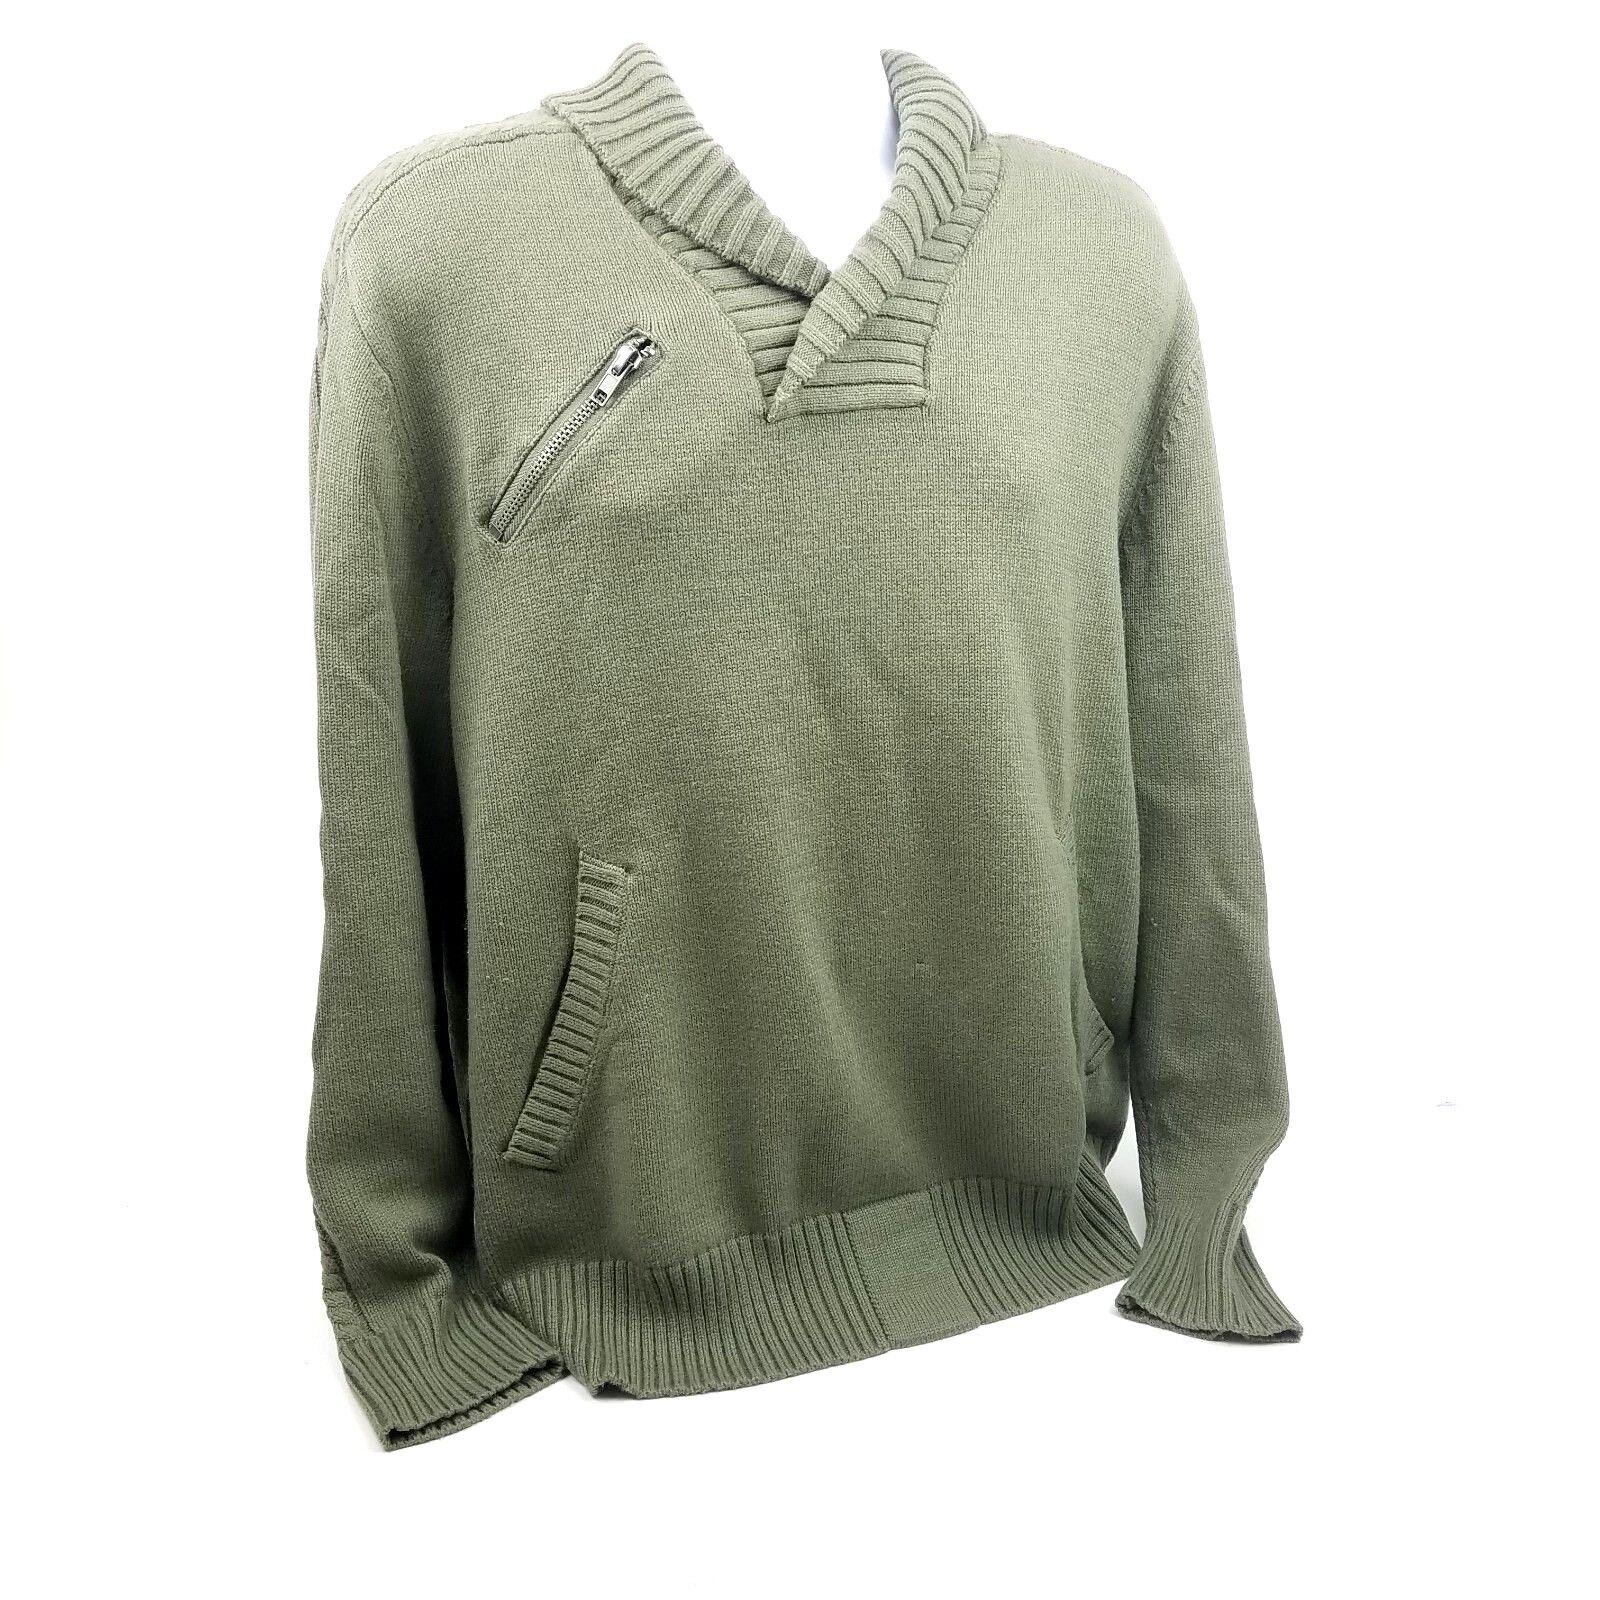 Darring USA Premium Dry Goods Sweater Green Cotton Blend Button collar LS Lg